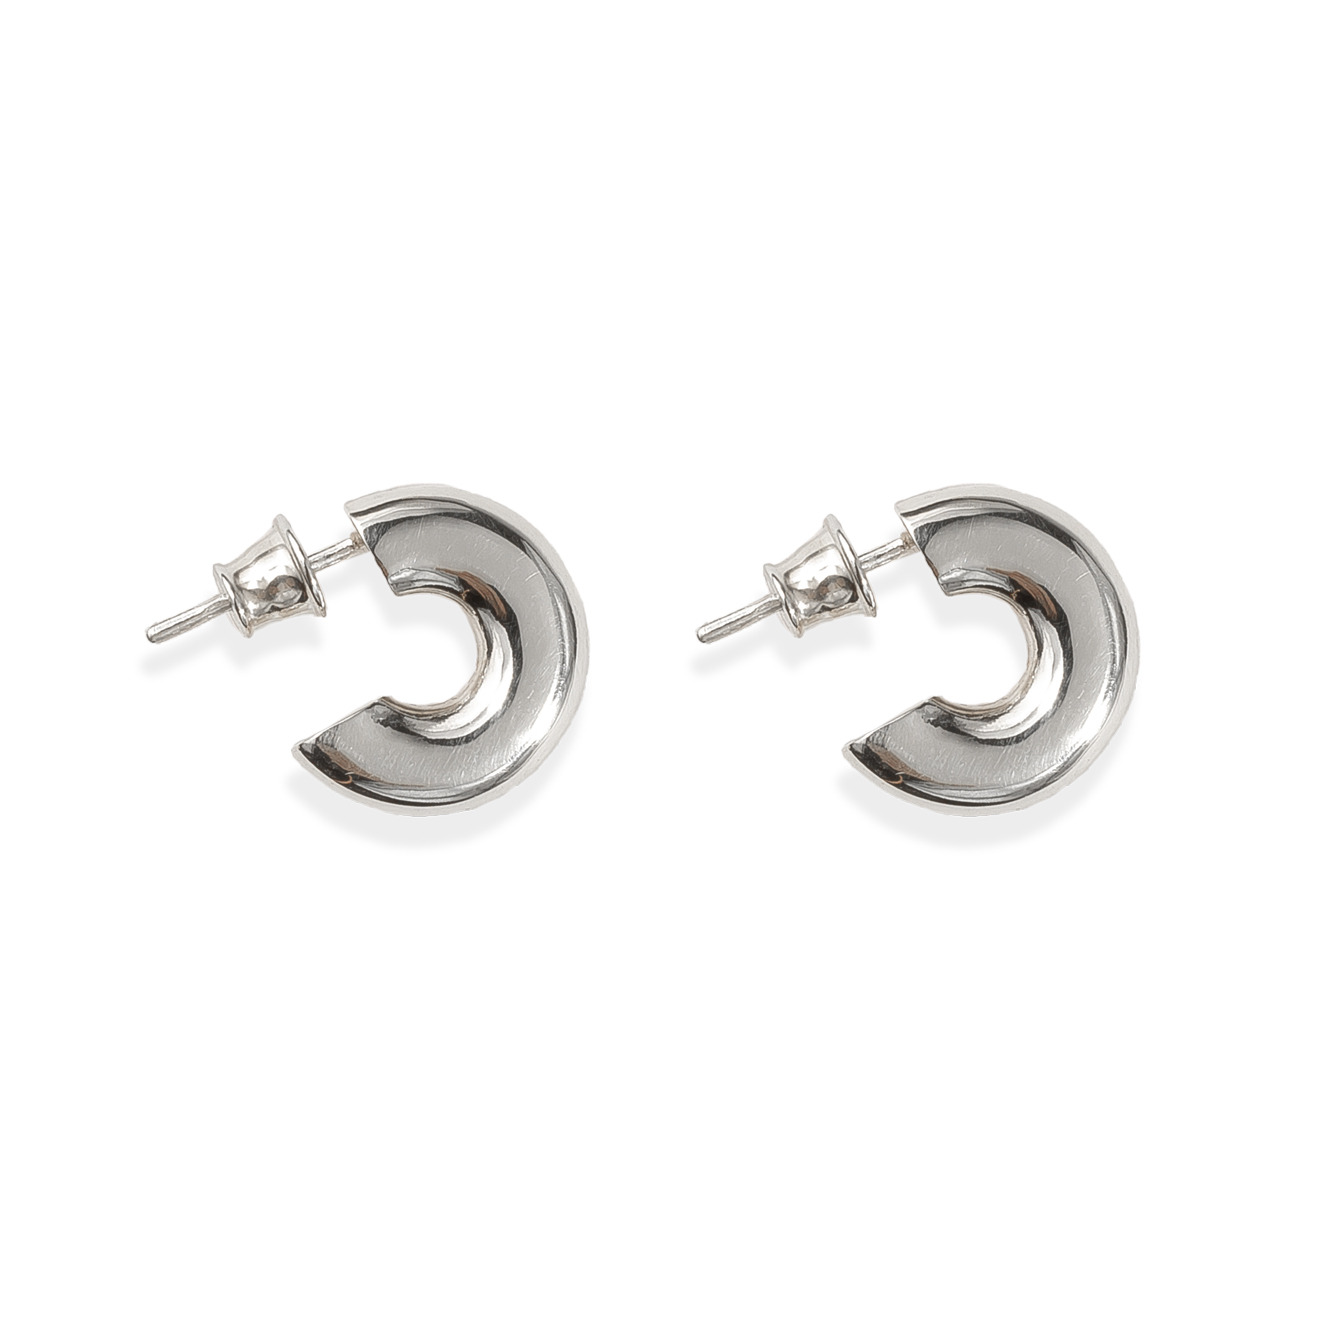 APRIL Маленькие серьги-кольца из серебра BASE04 S кольца sokolov 713382 s